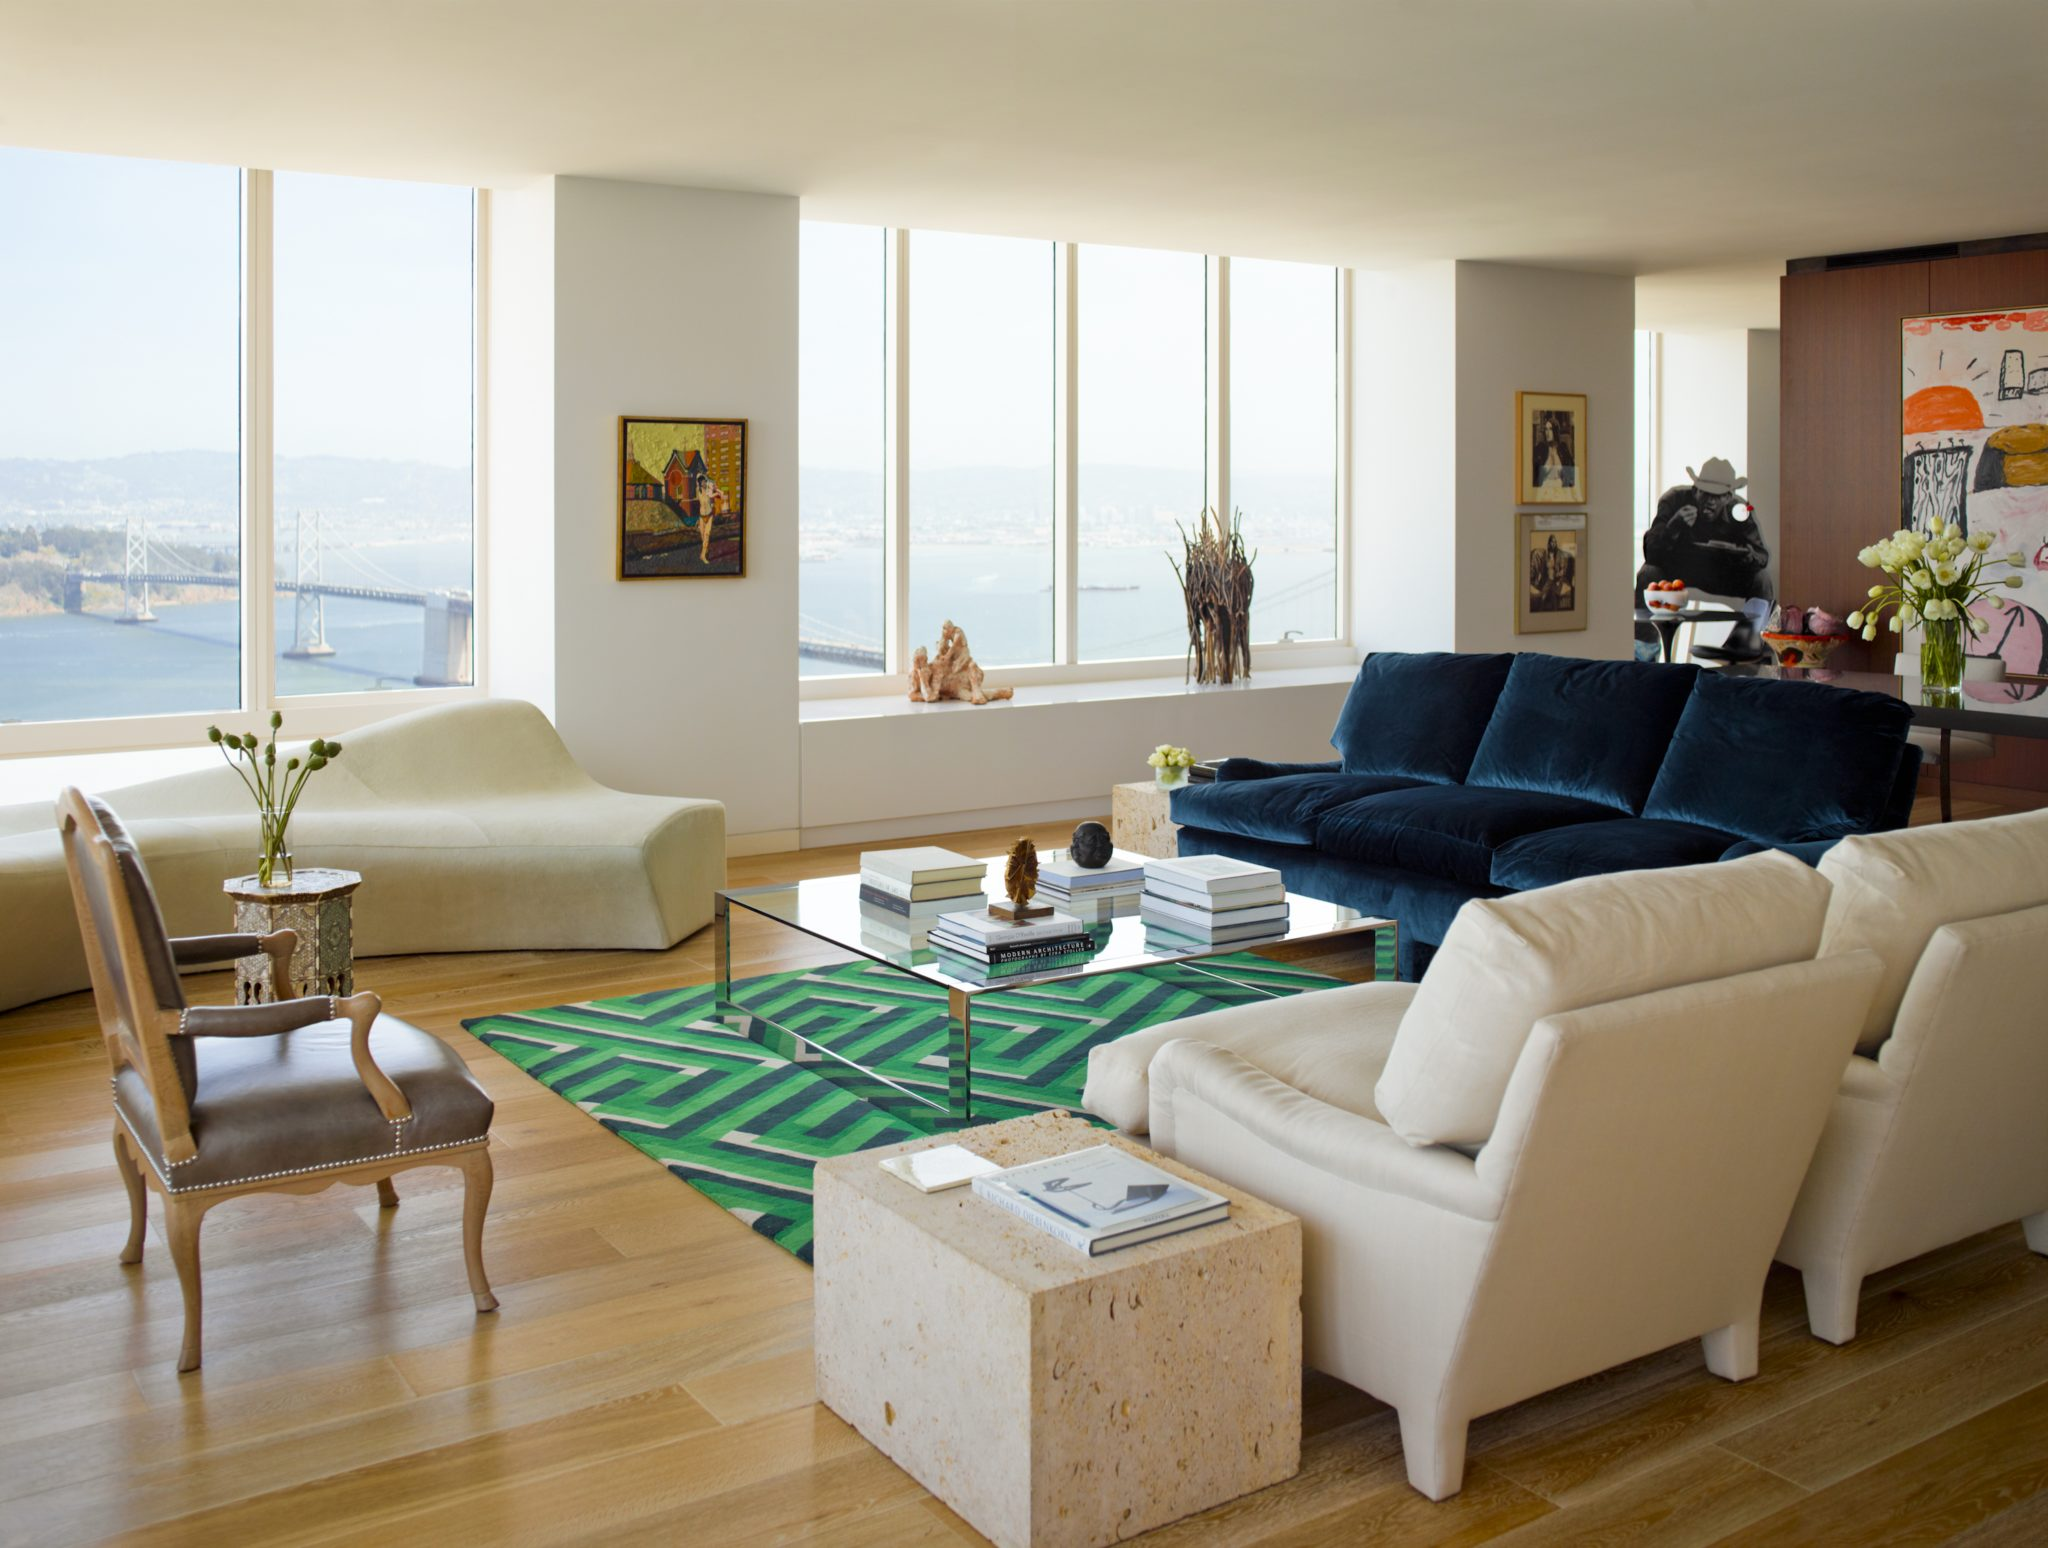 Interior design by BAMO